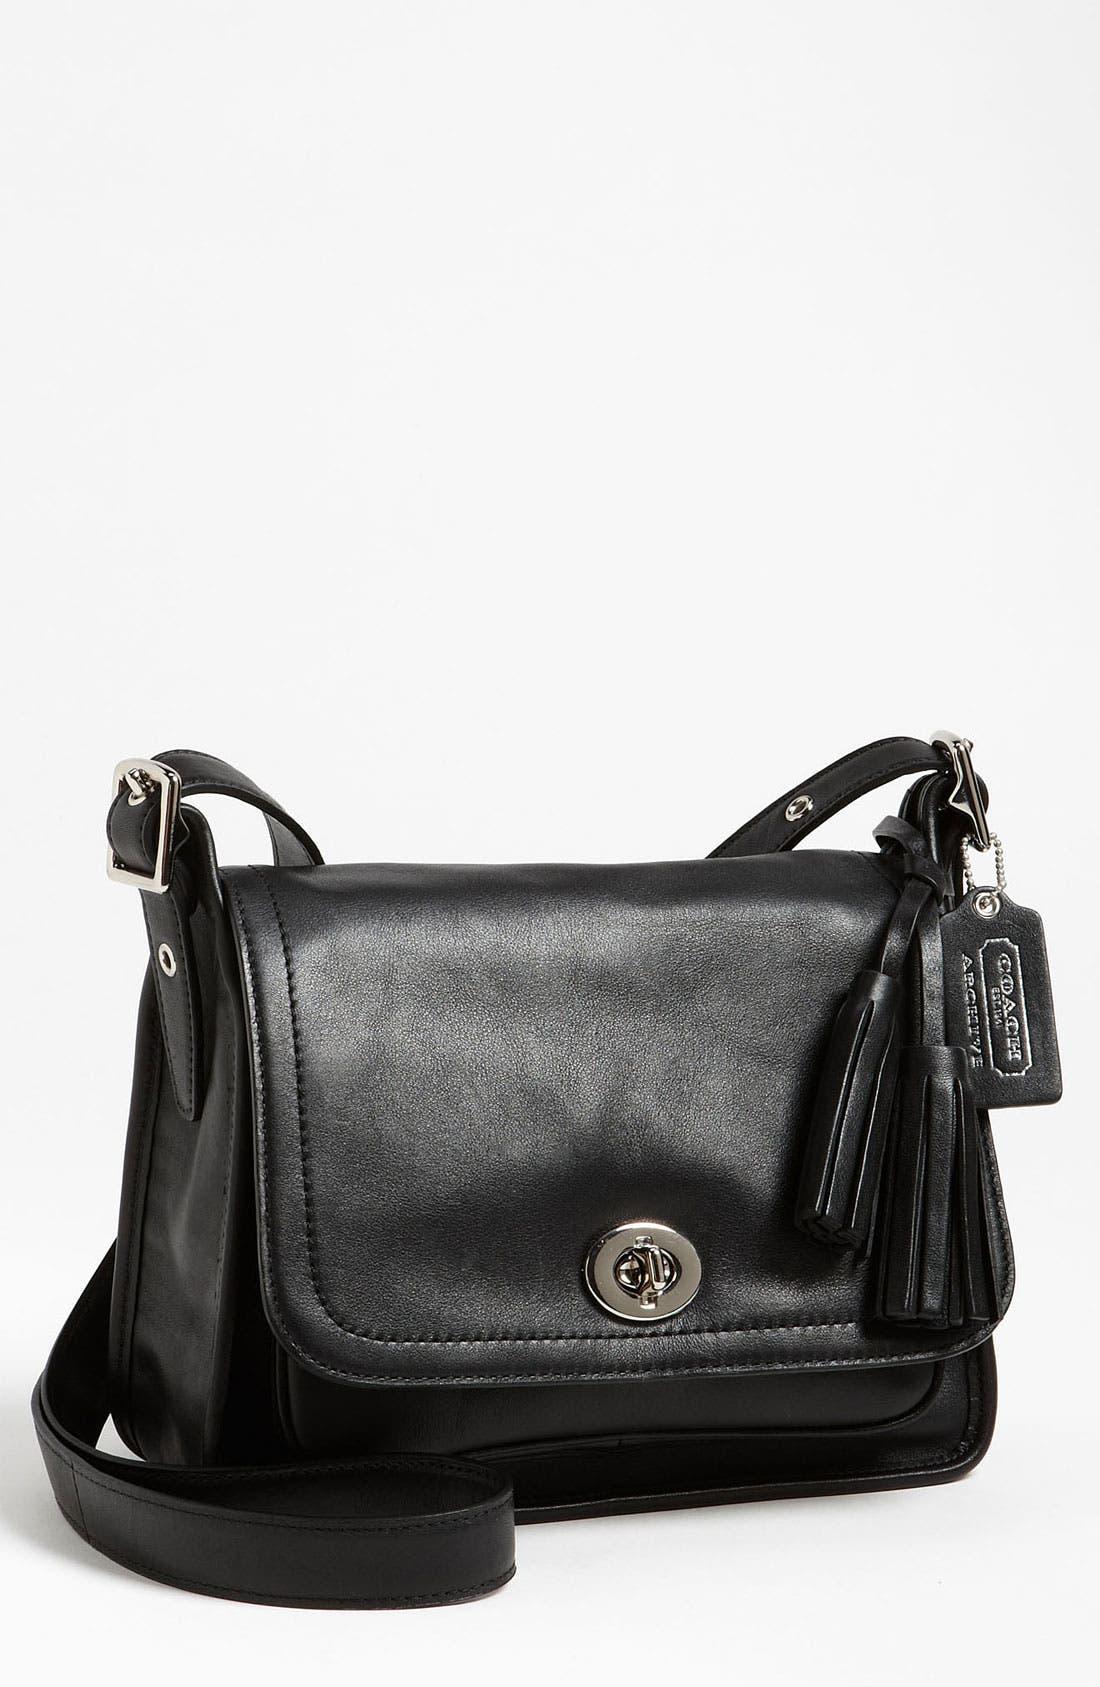 Alternate Image 1 Selected - COACH 'Legacy Archival - Rambler' Crossbody Bag